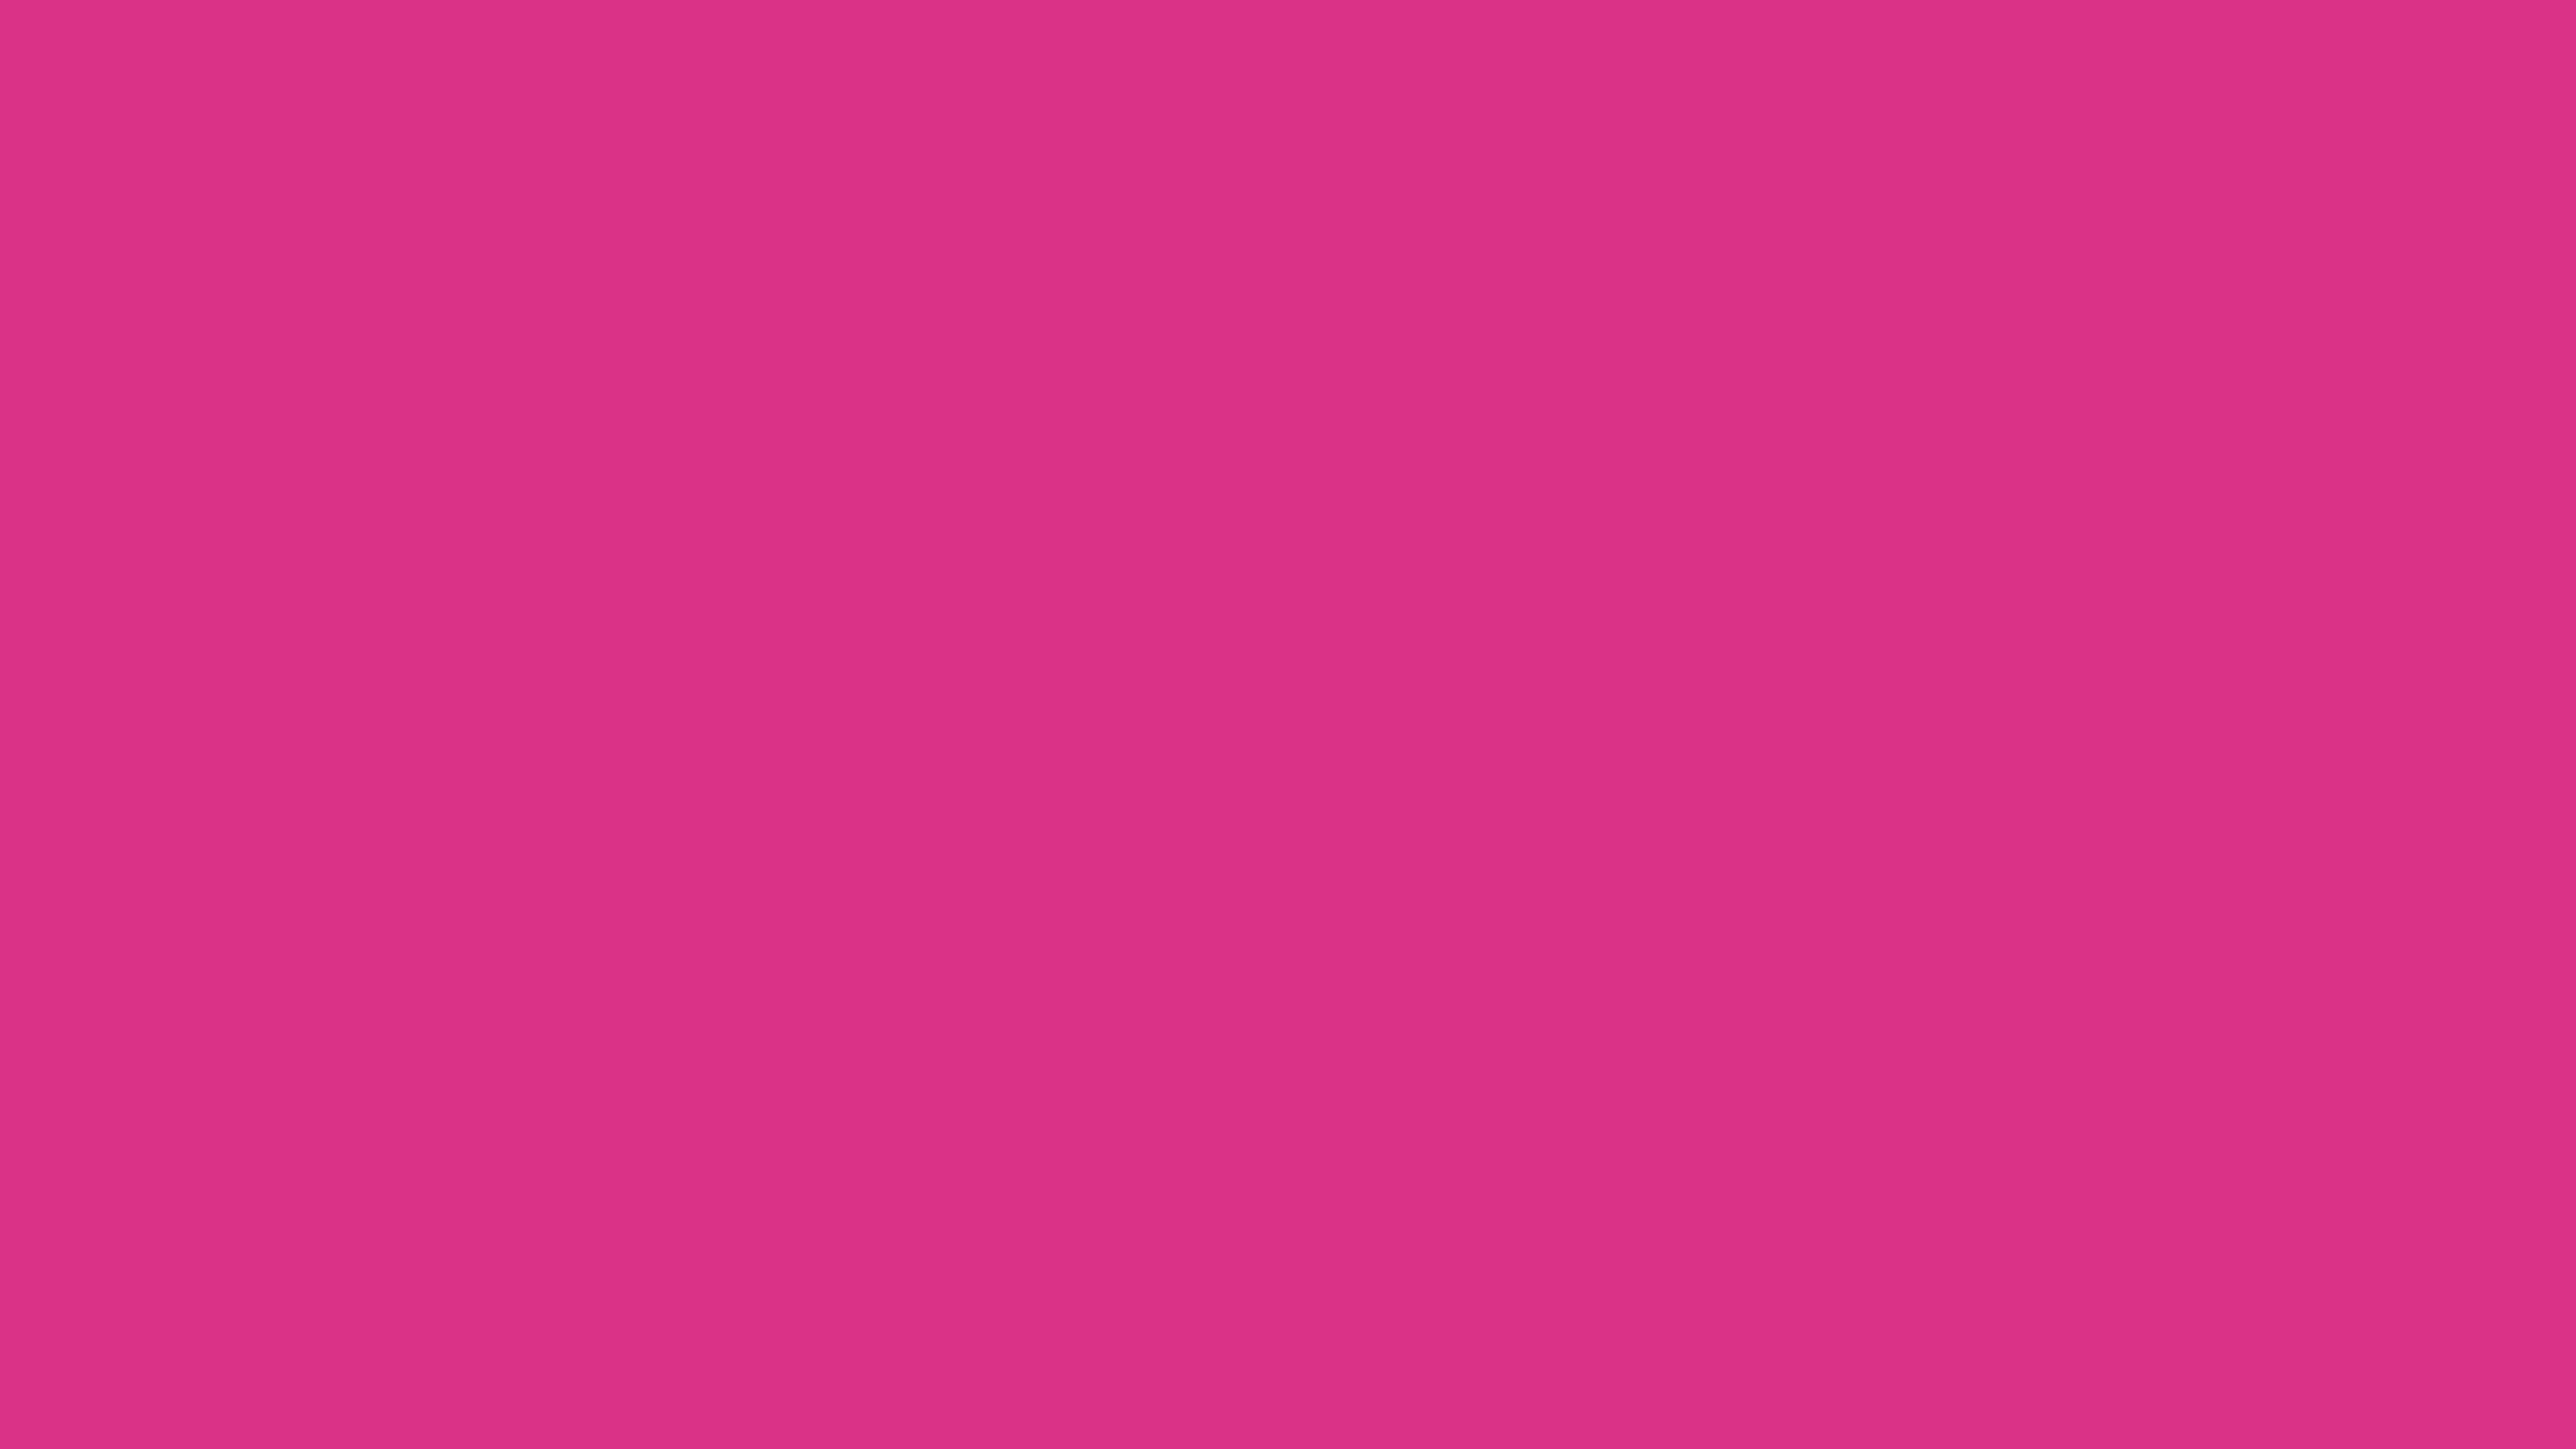 4096x2304 Deep Cerise Solid Color Background